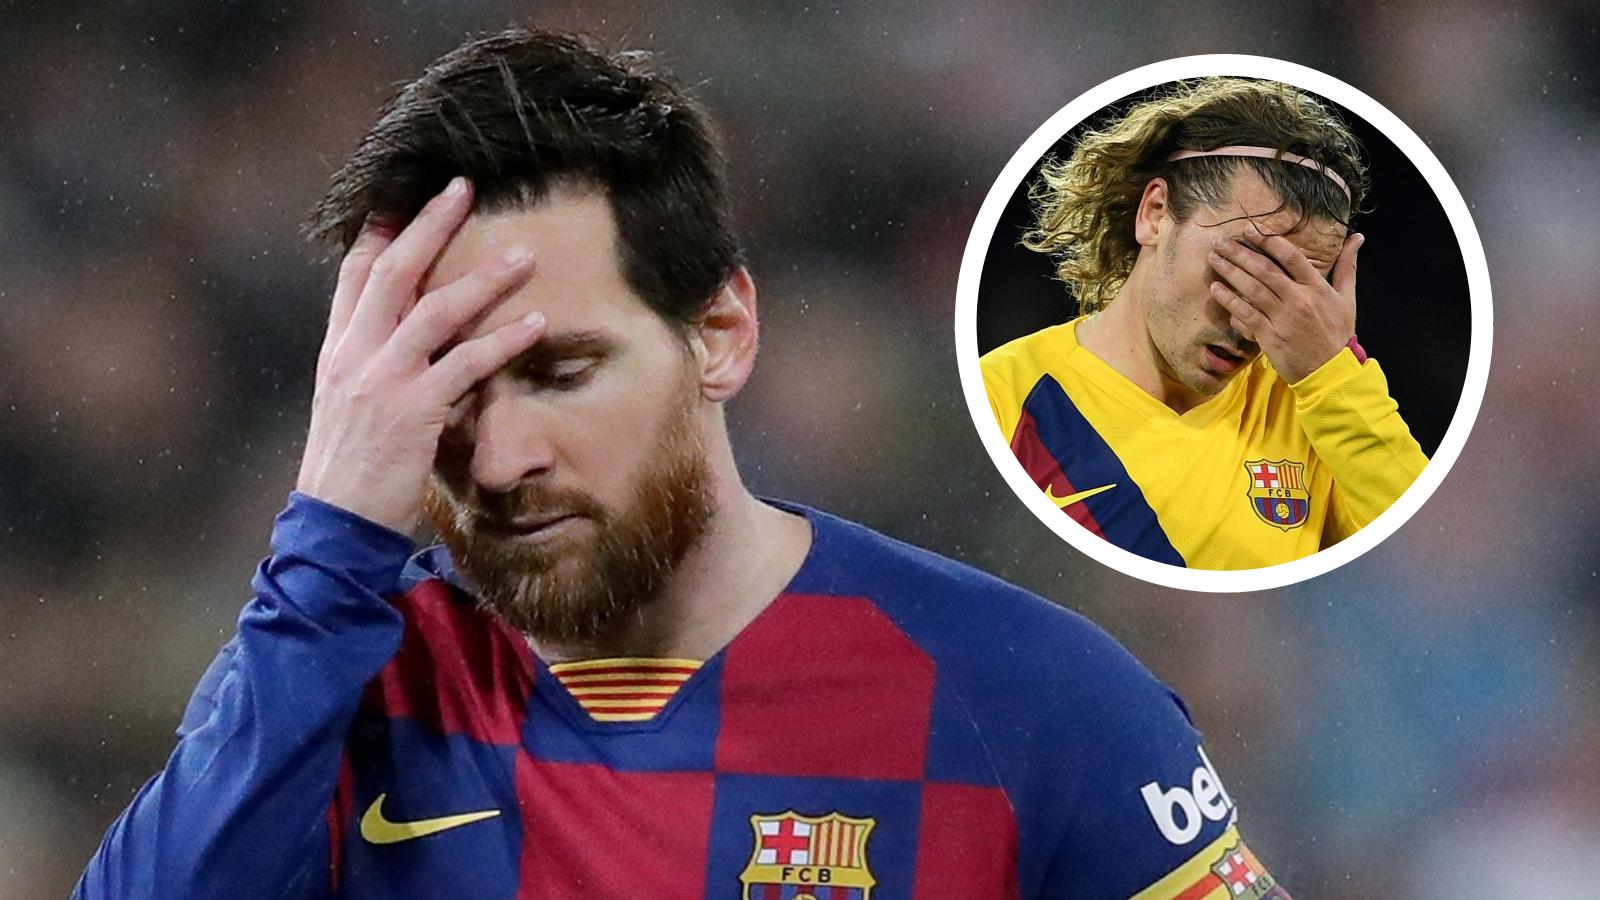 Dugarry calls Messi 'half autistic' in shocking Barcelona & Griezmann rant